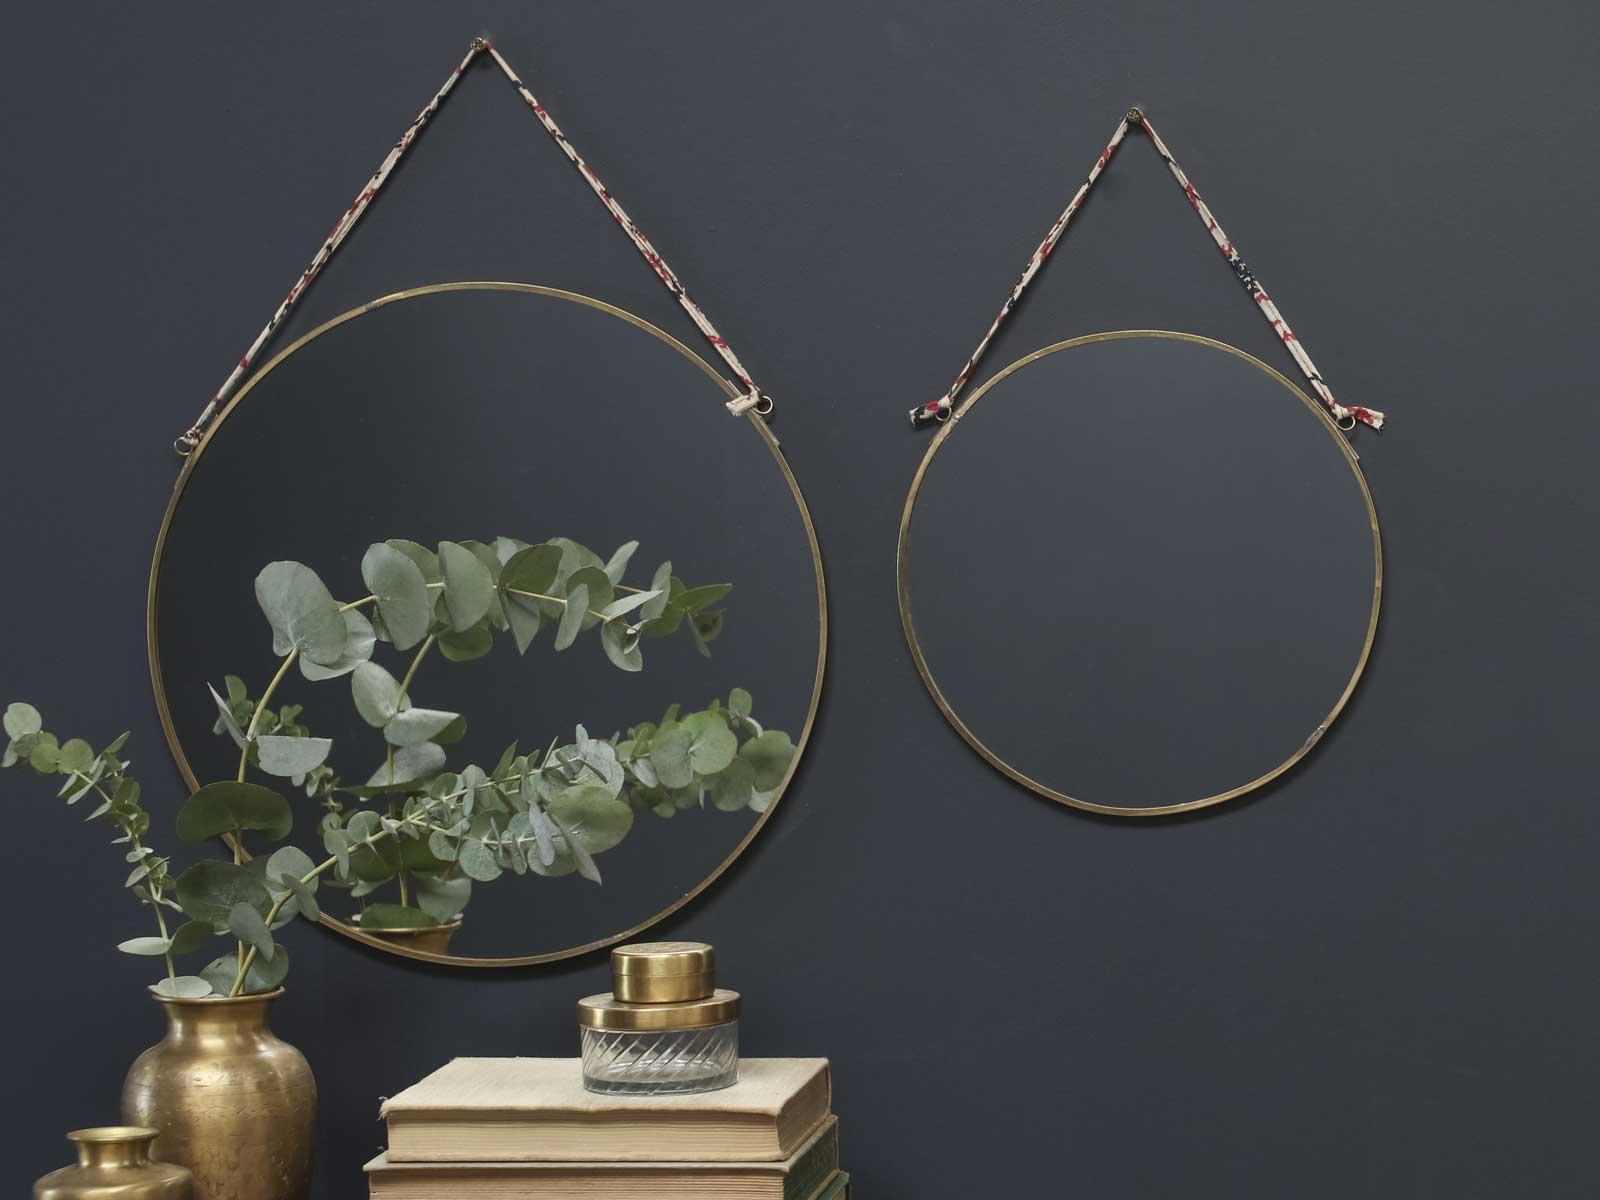 vitrine-fetes-metropolitan-montpellier-miroirs-ronds